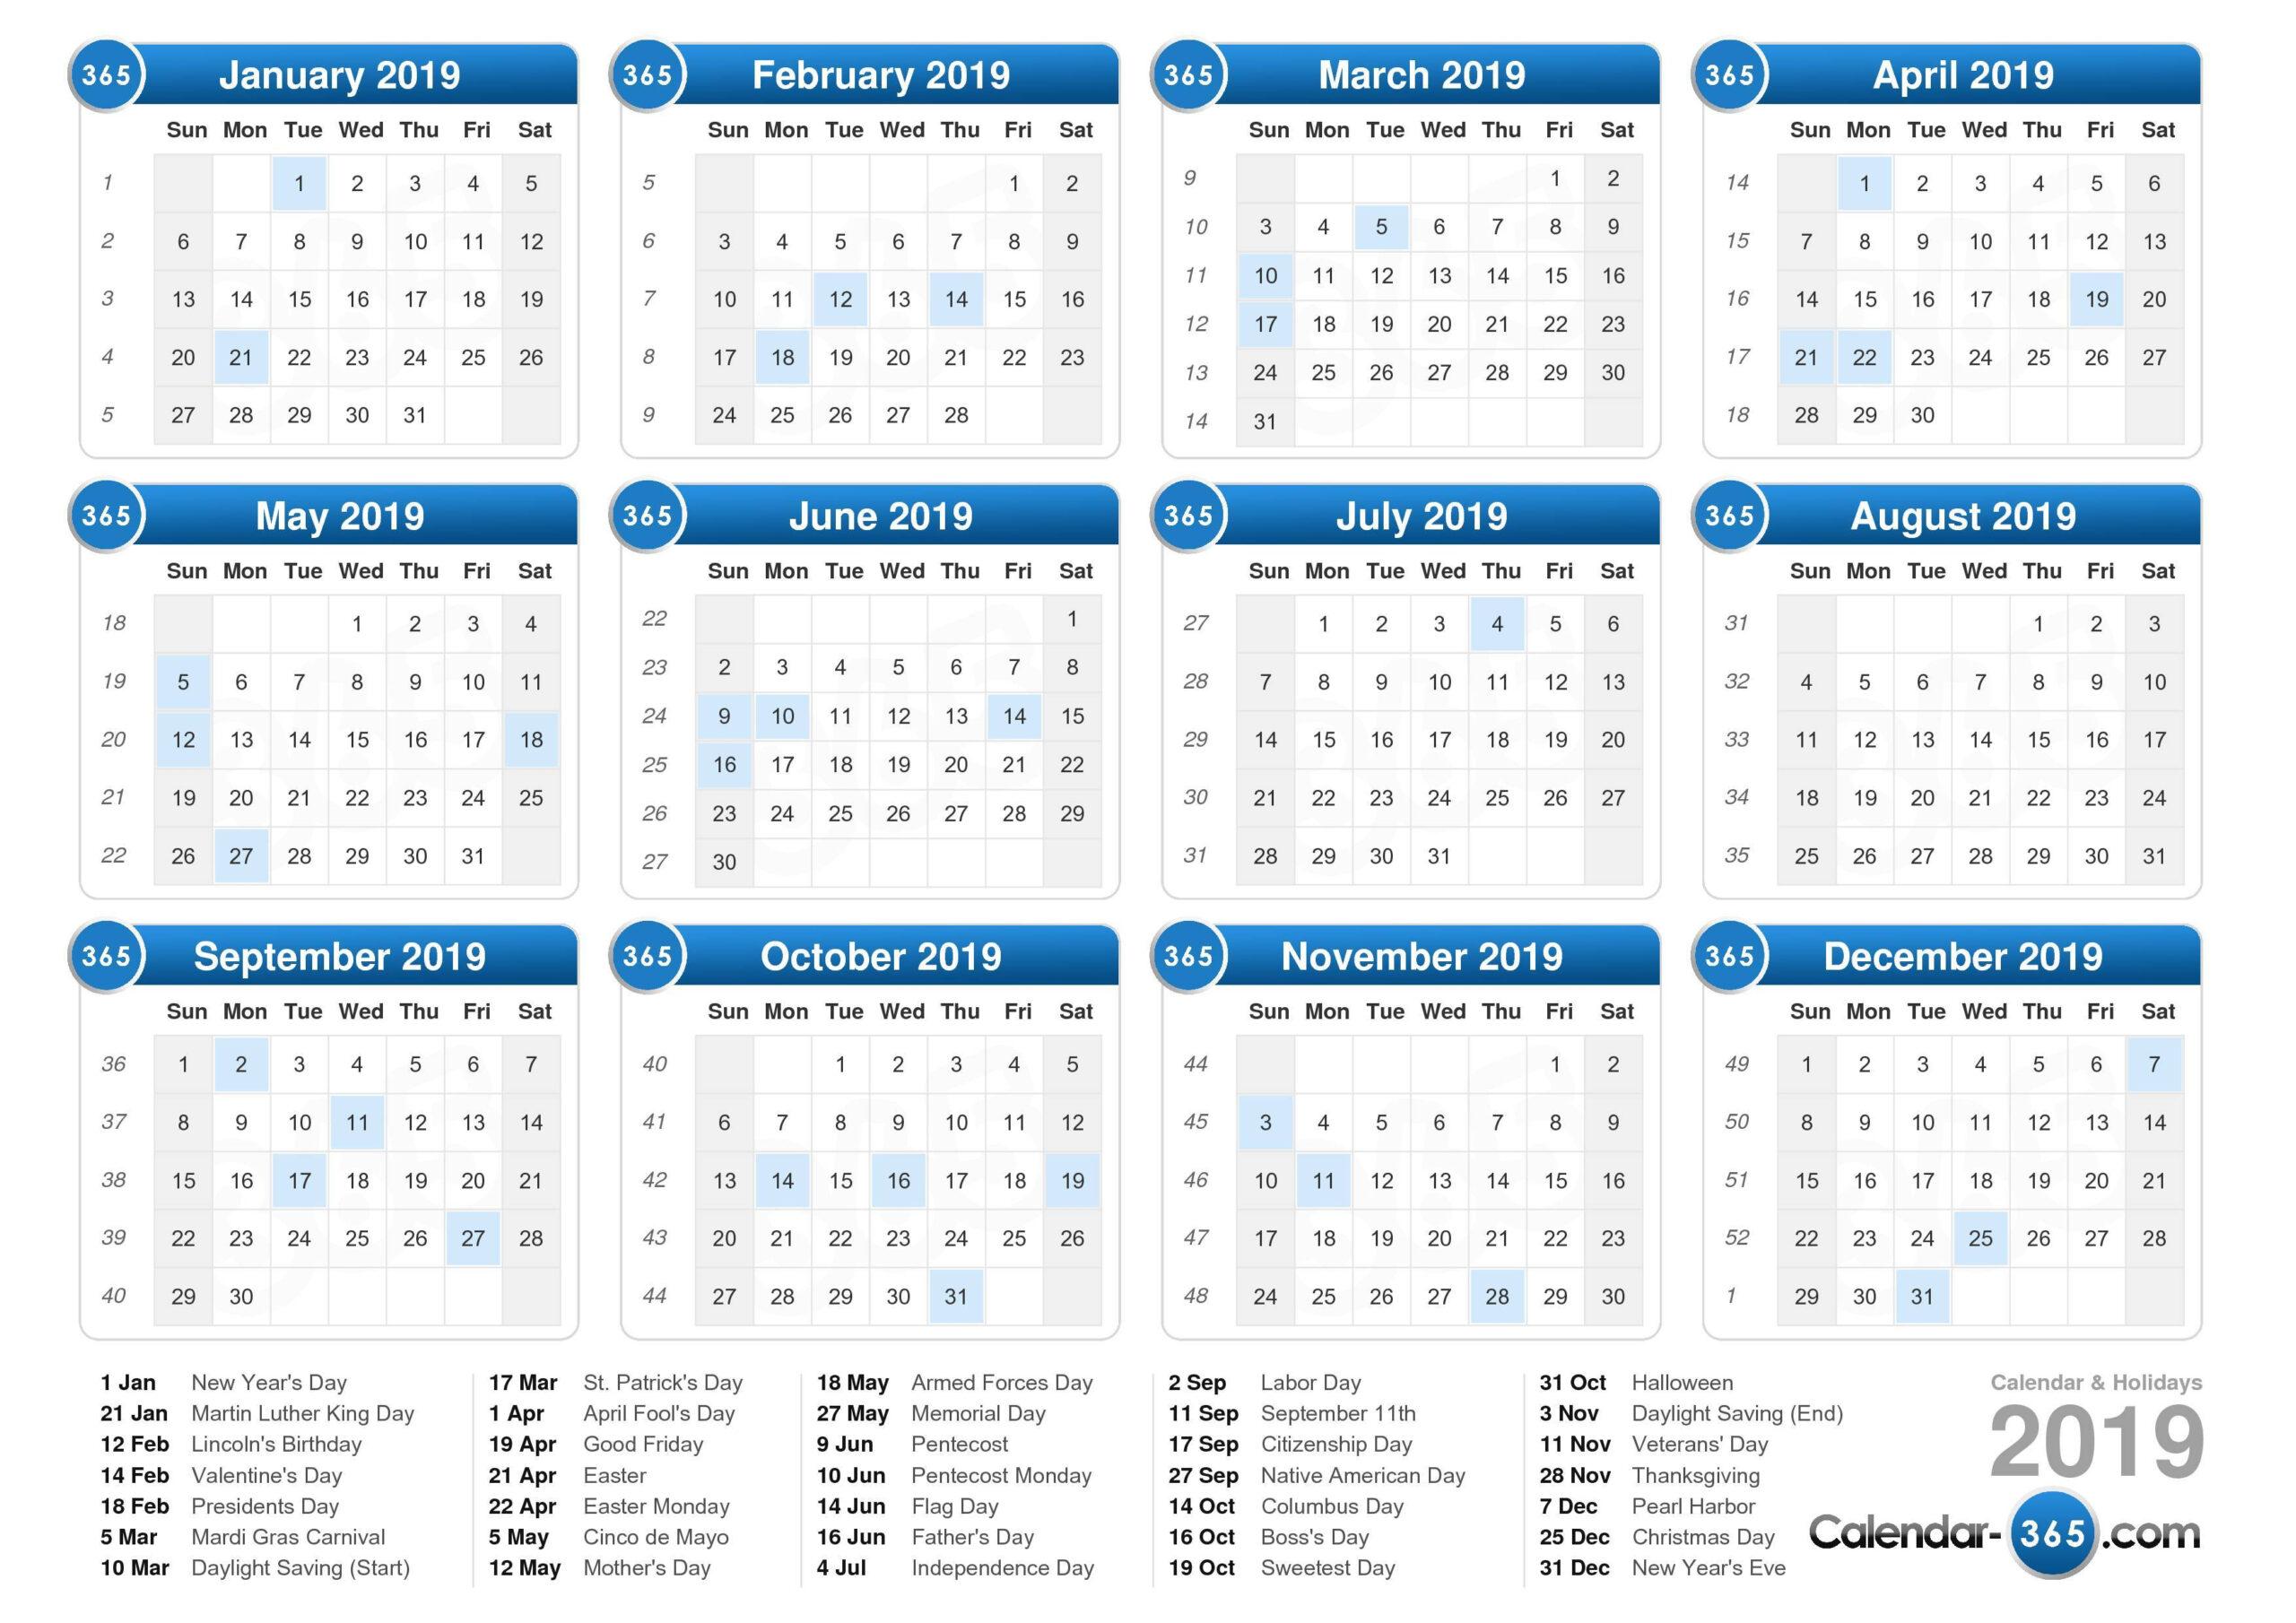 2019-2020 Calendar Financial Week Numbers | Calendar